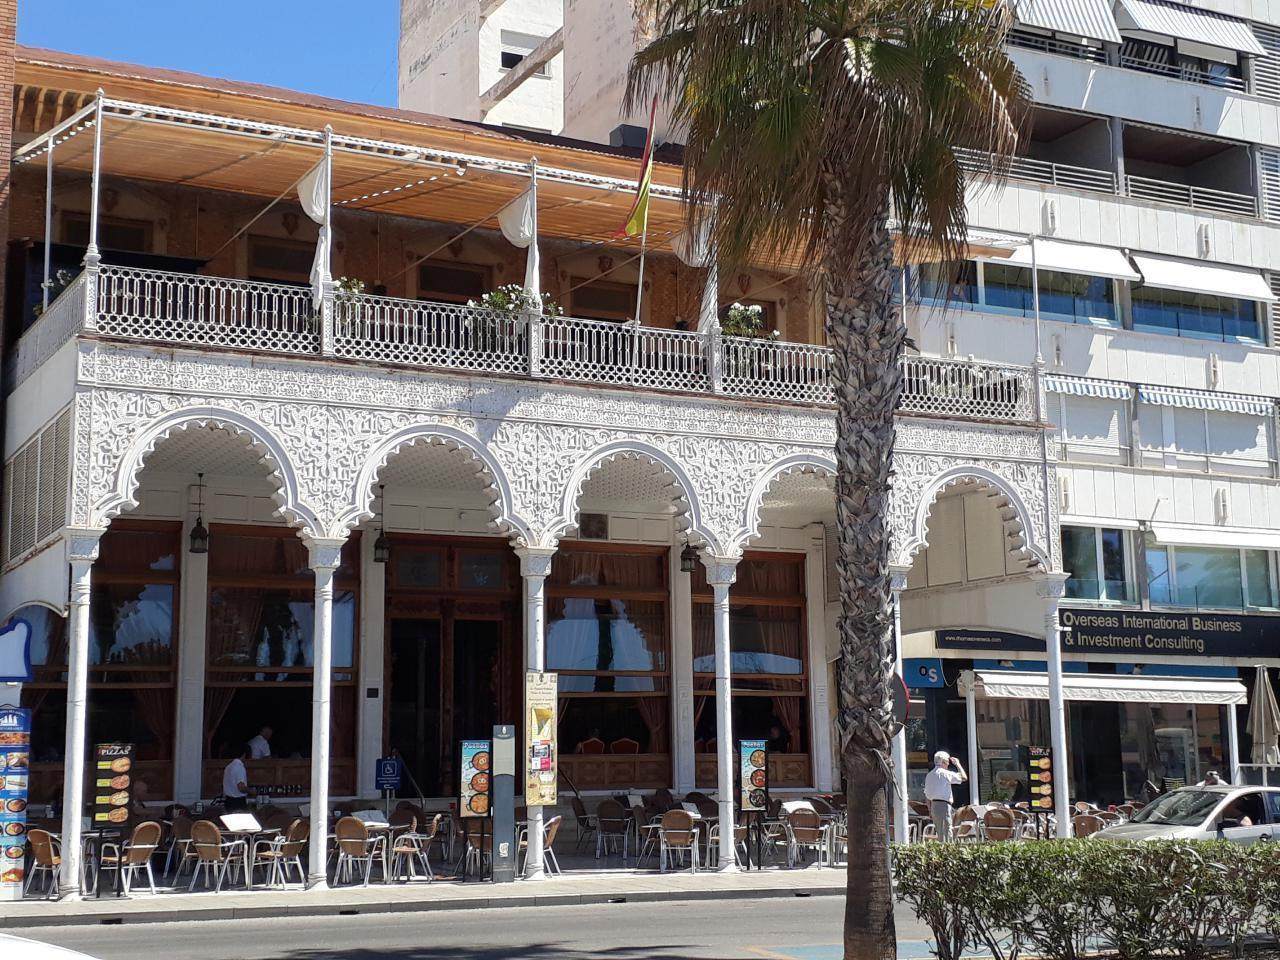 Appartement de vacances mit Parkplatz und Pool (2068497), Torrevieja, Costa Blanca, Valence, Espagne, image 31